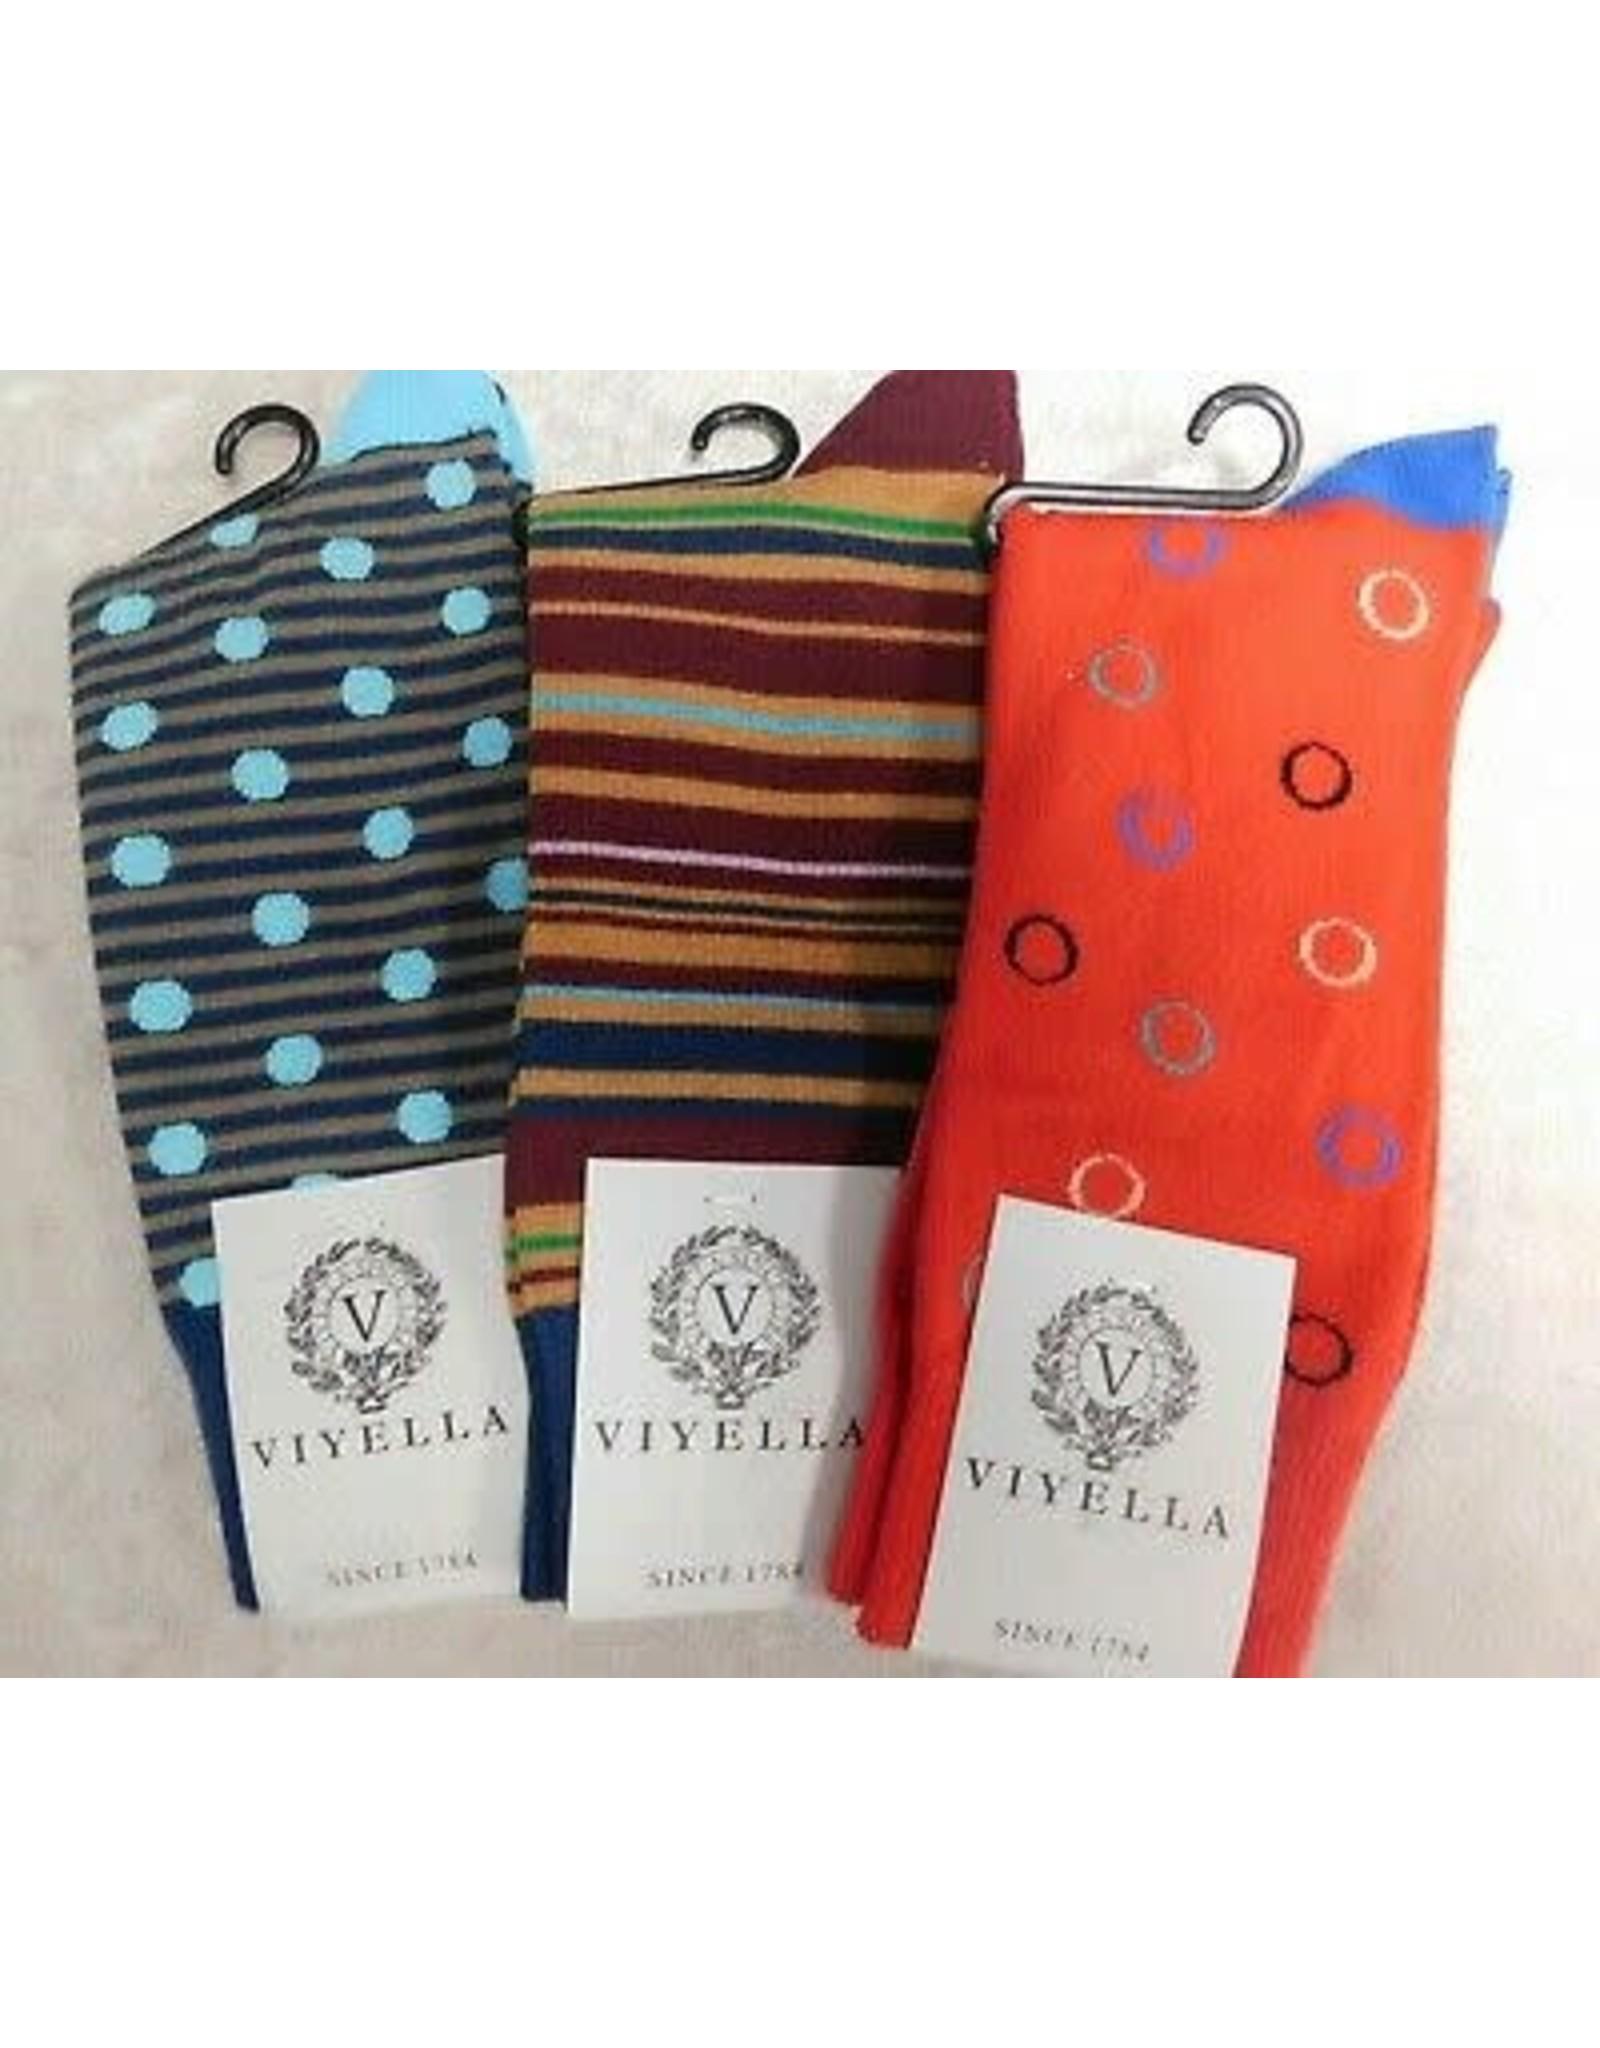 Viyella Viyella Dress Socks